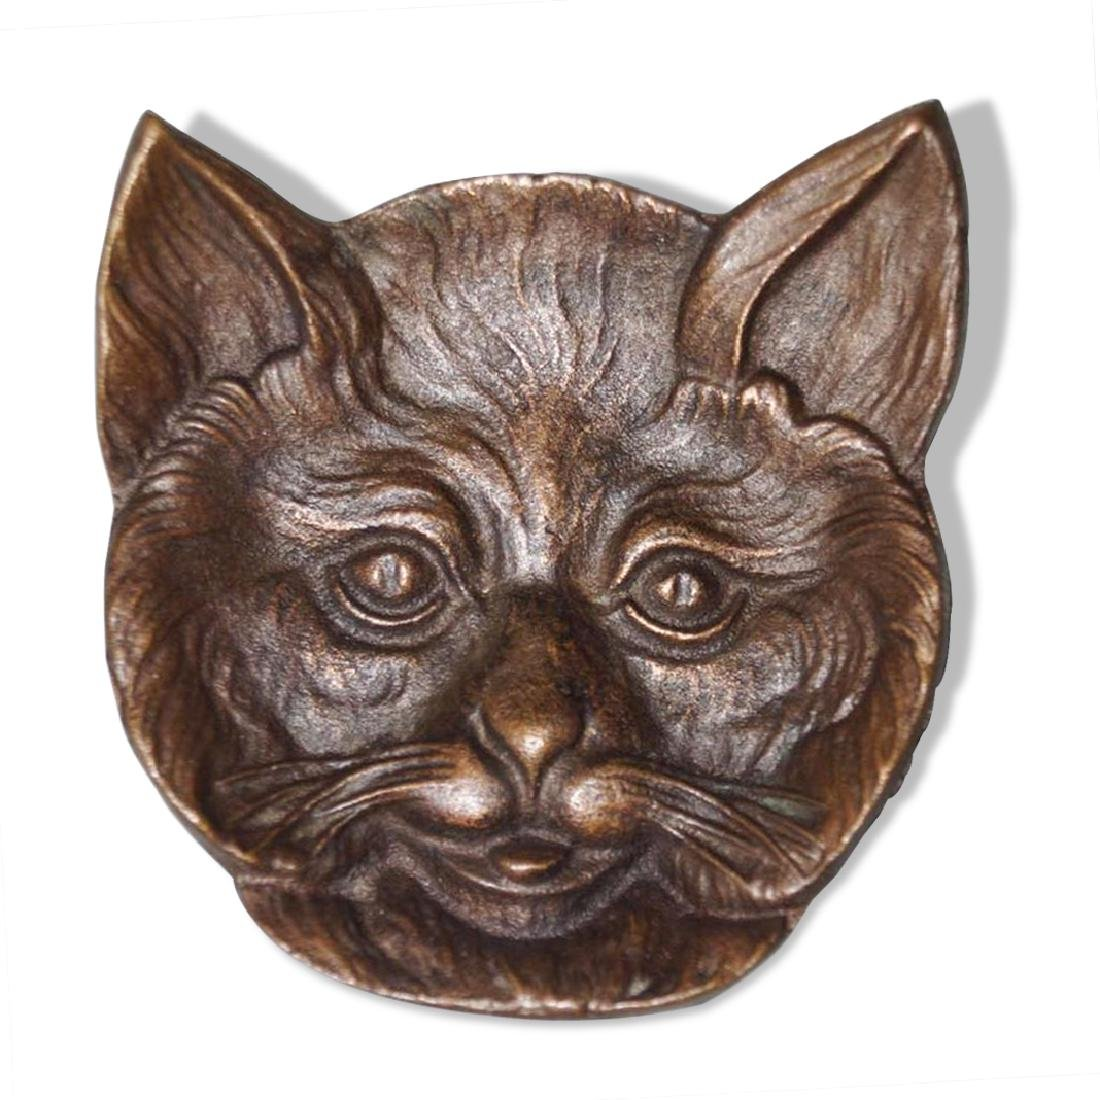 Antique Cat Head Cast Brass Tip Tray